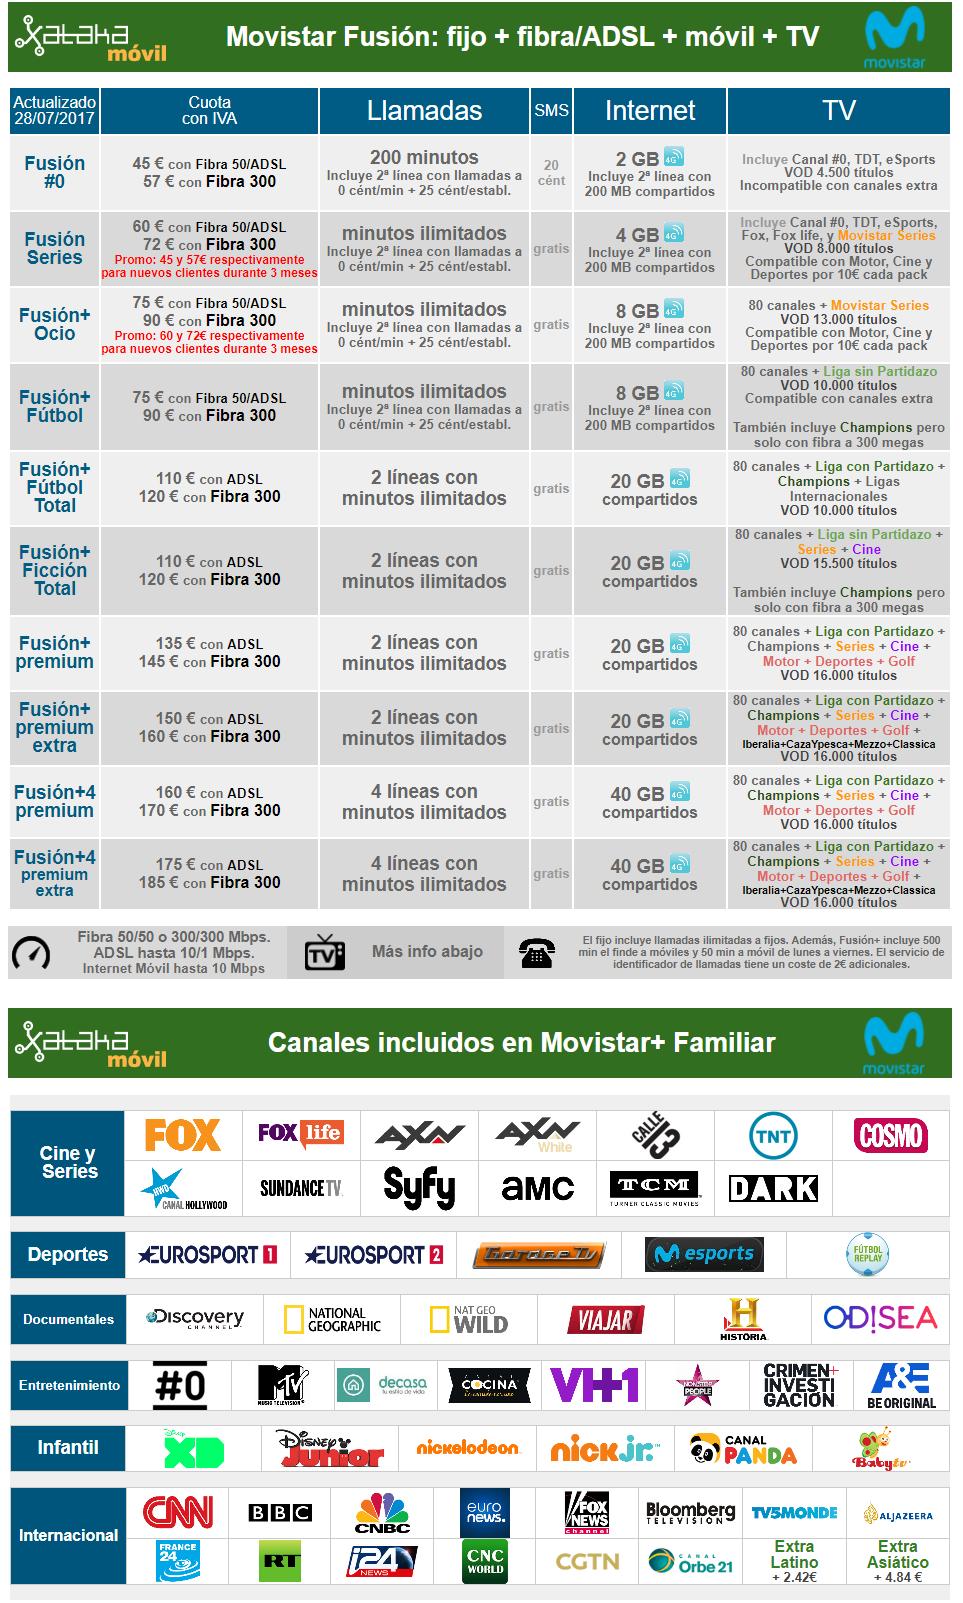 Nuevas Tarifas Movistar Fusion Agosto 2017